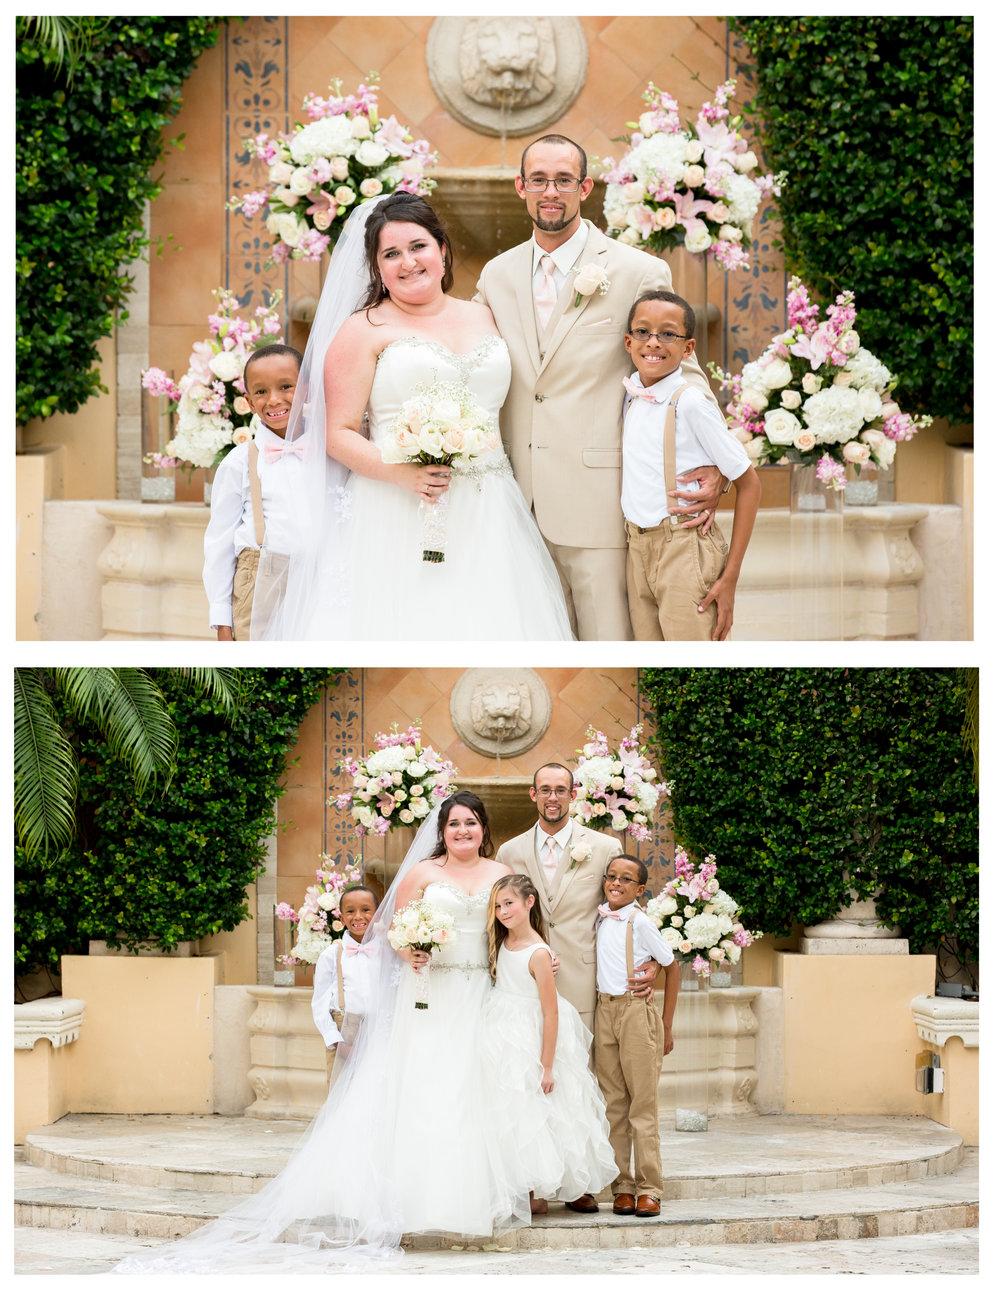 Benvenuto_Boynton Beach_ Wedding_Emily_&_Shawn 22.jpg